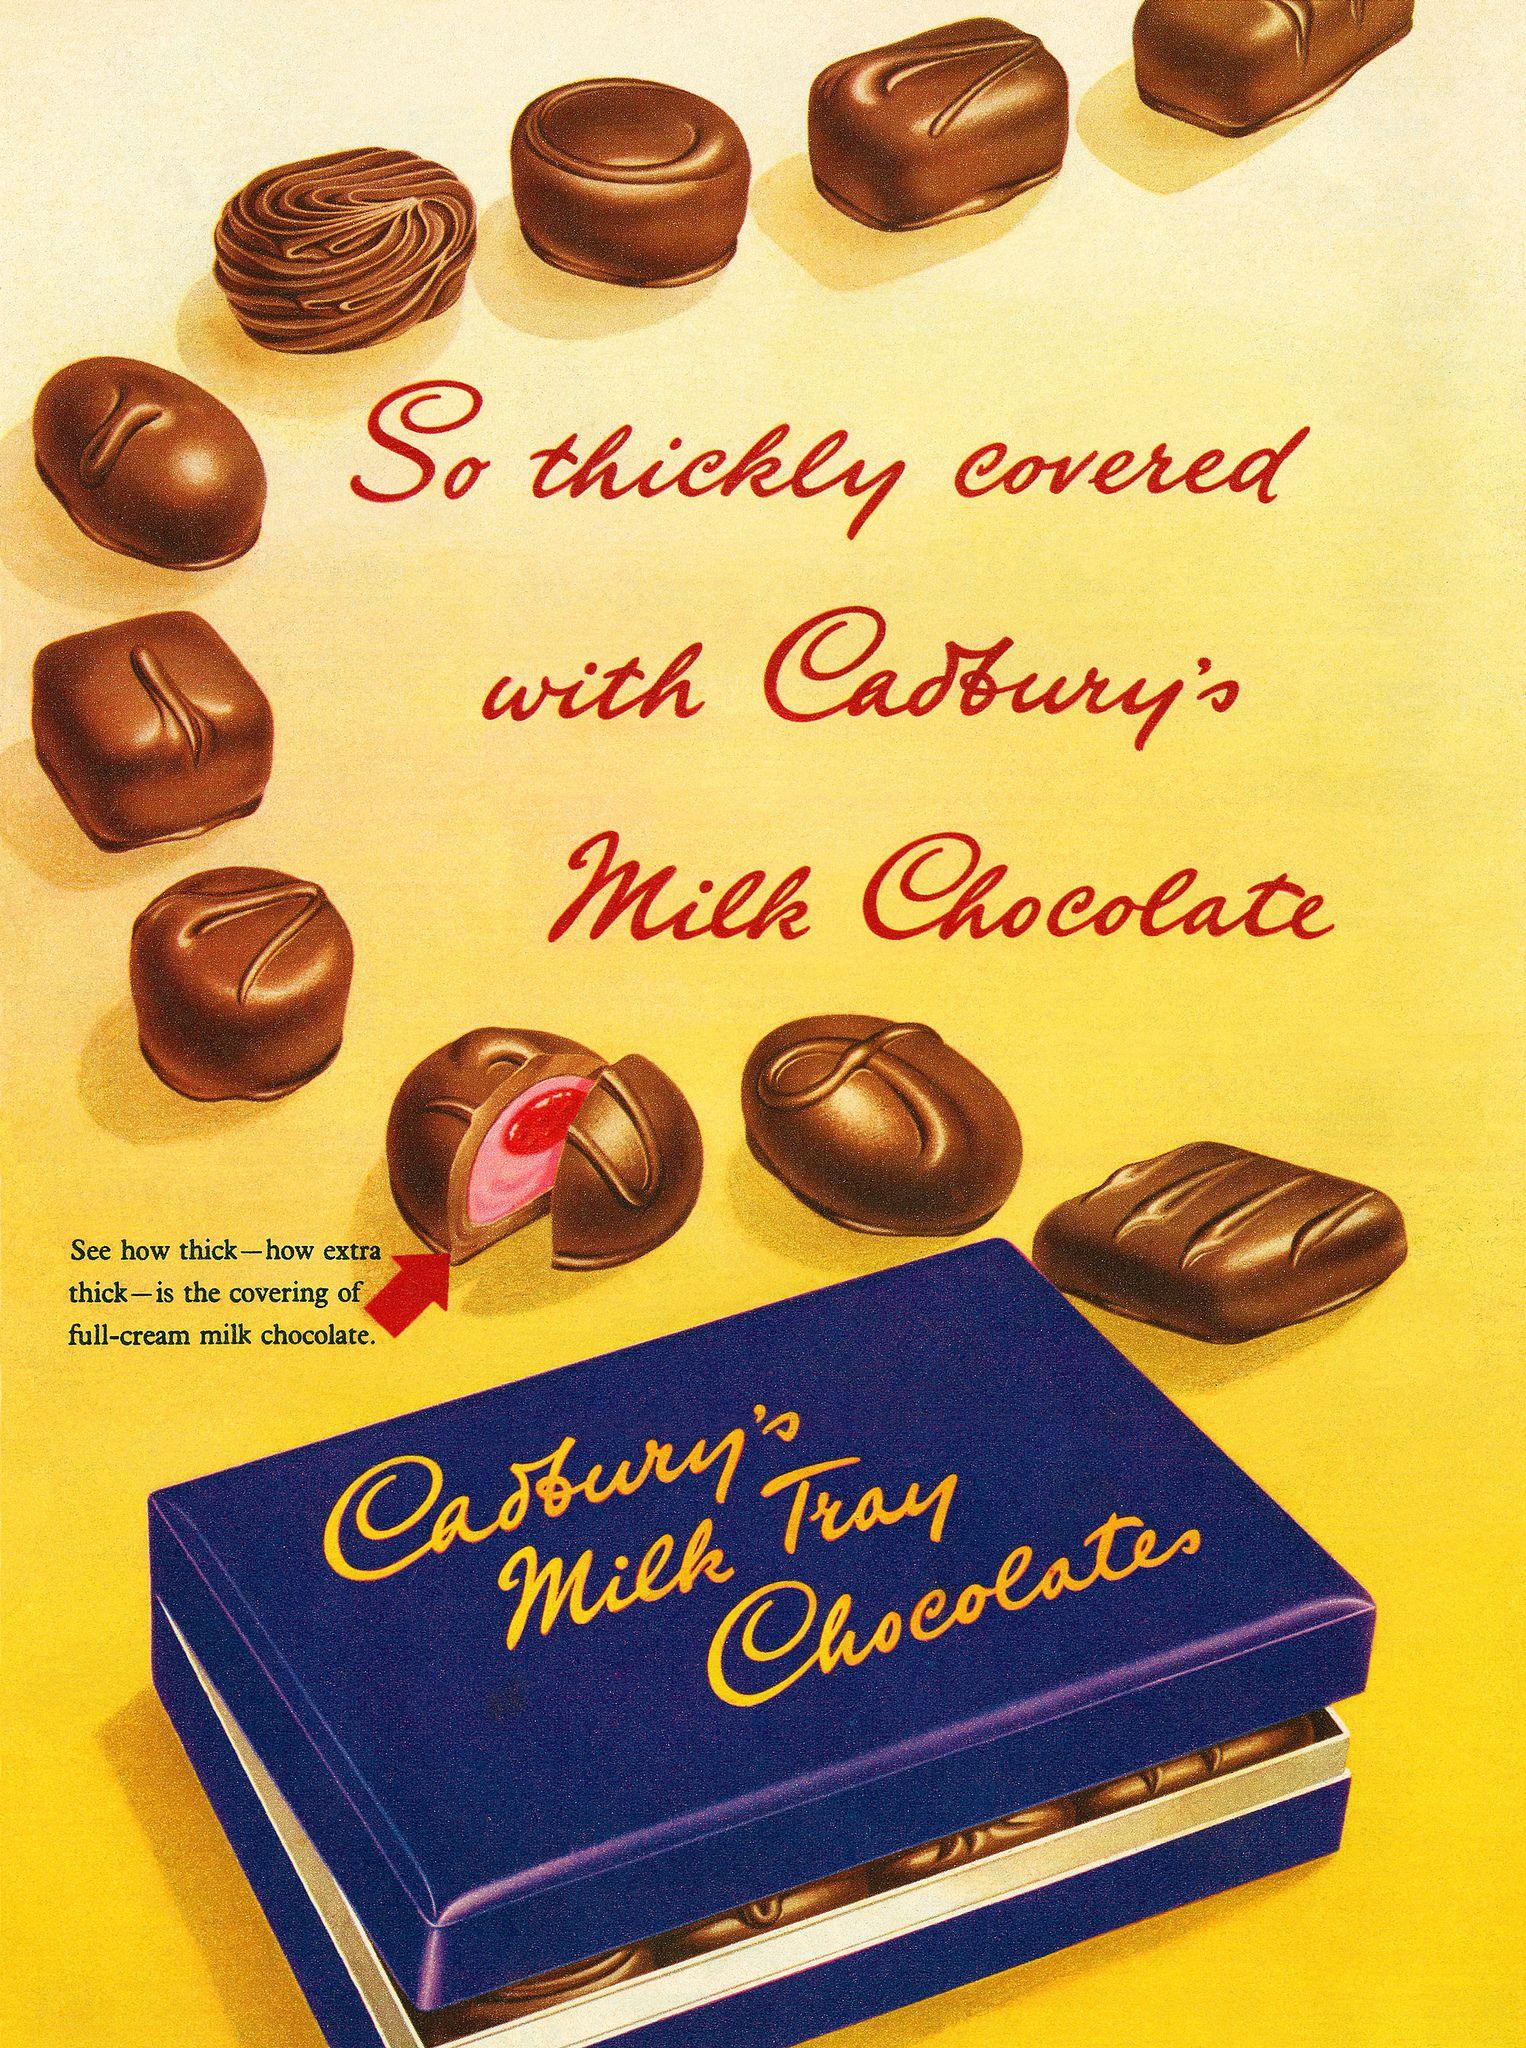 Vintage Magazine advertising poster reproduction. Cadburys milk tray chocolates